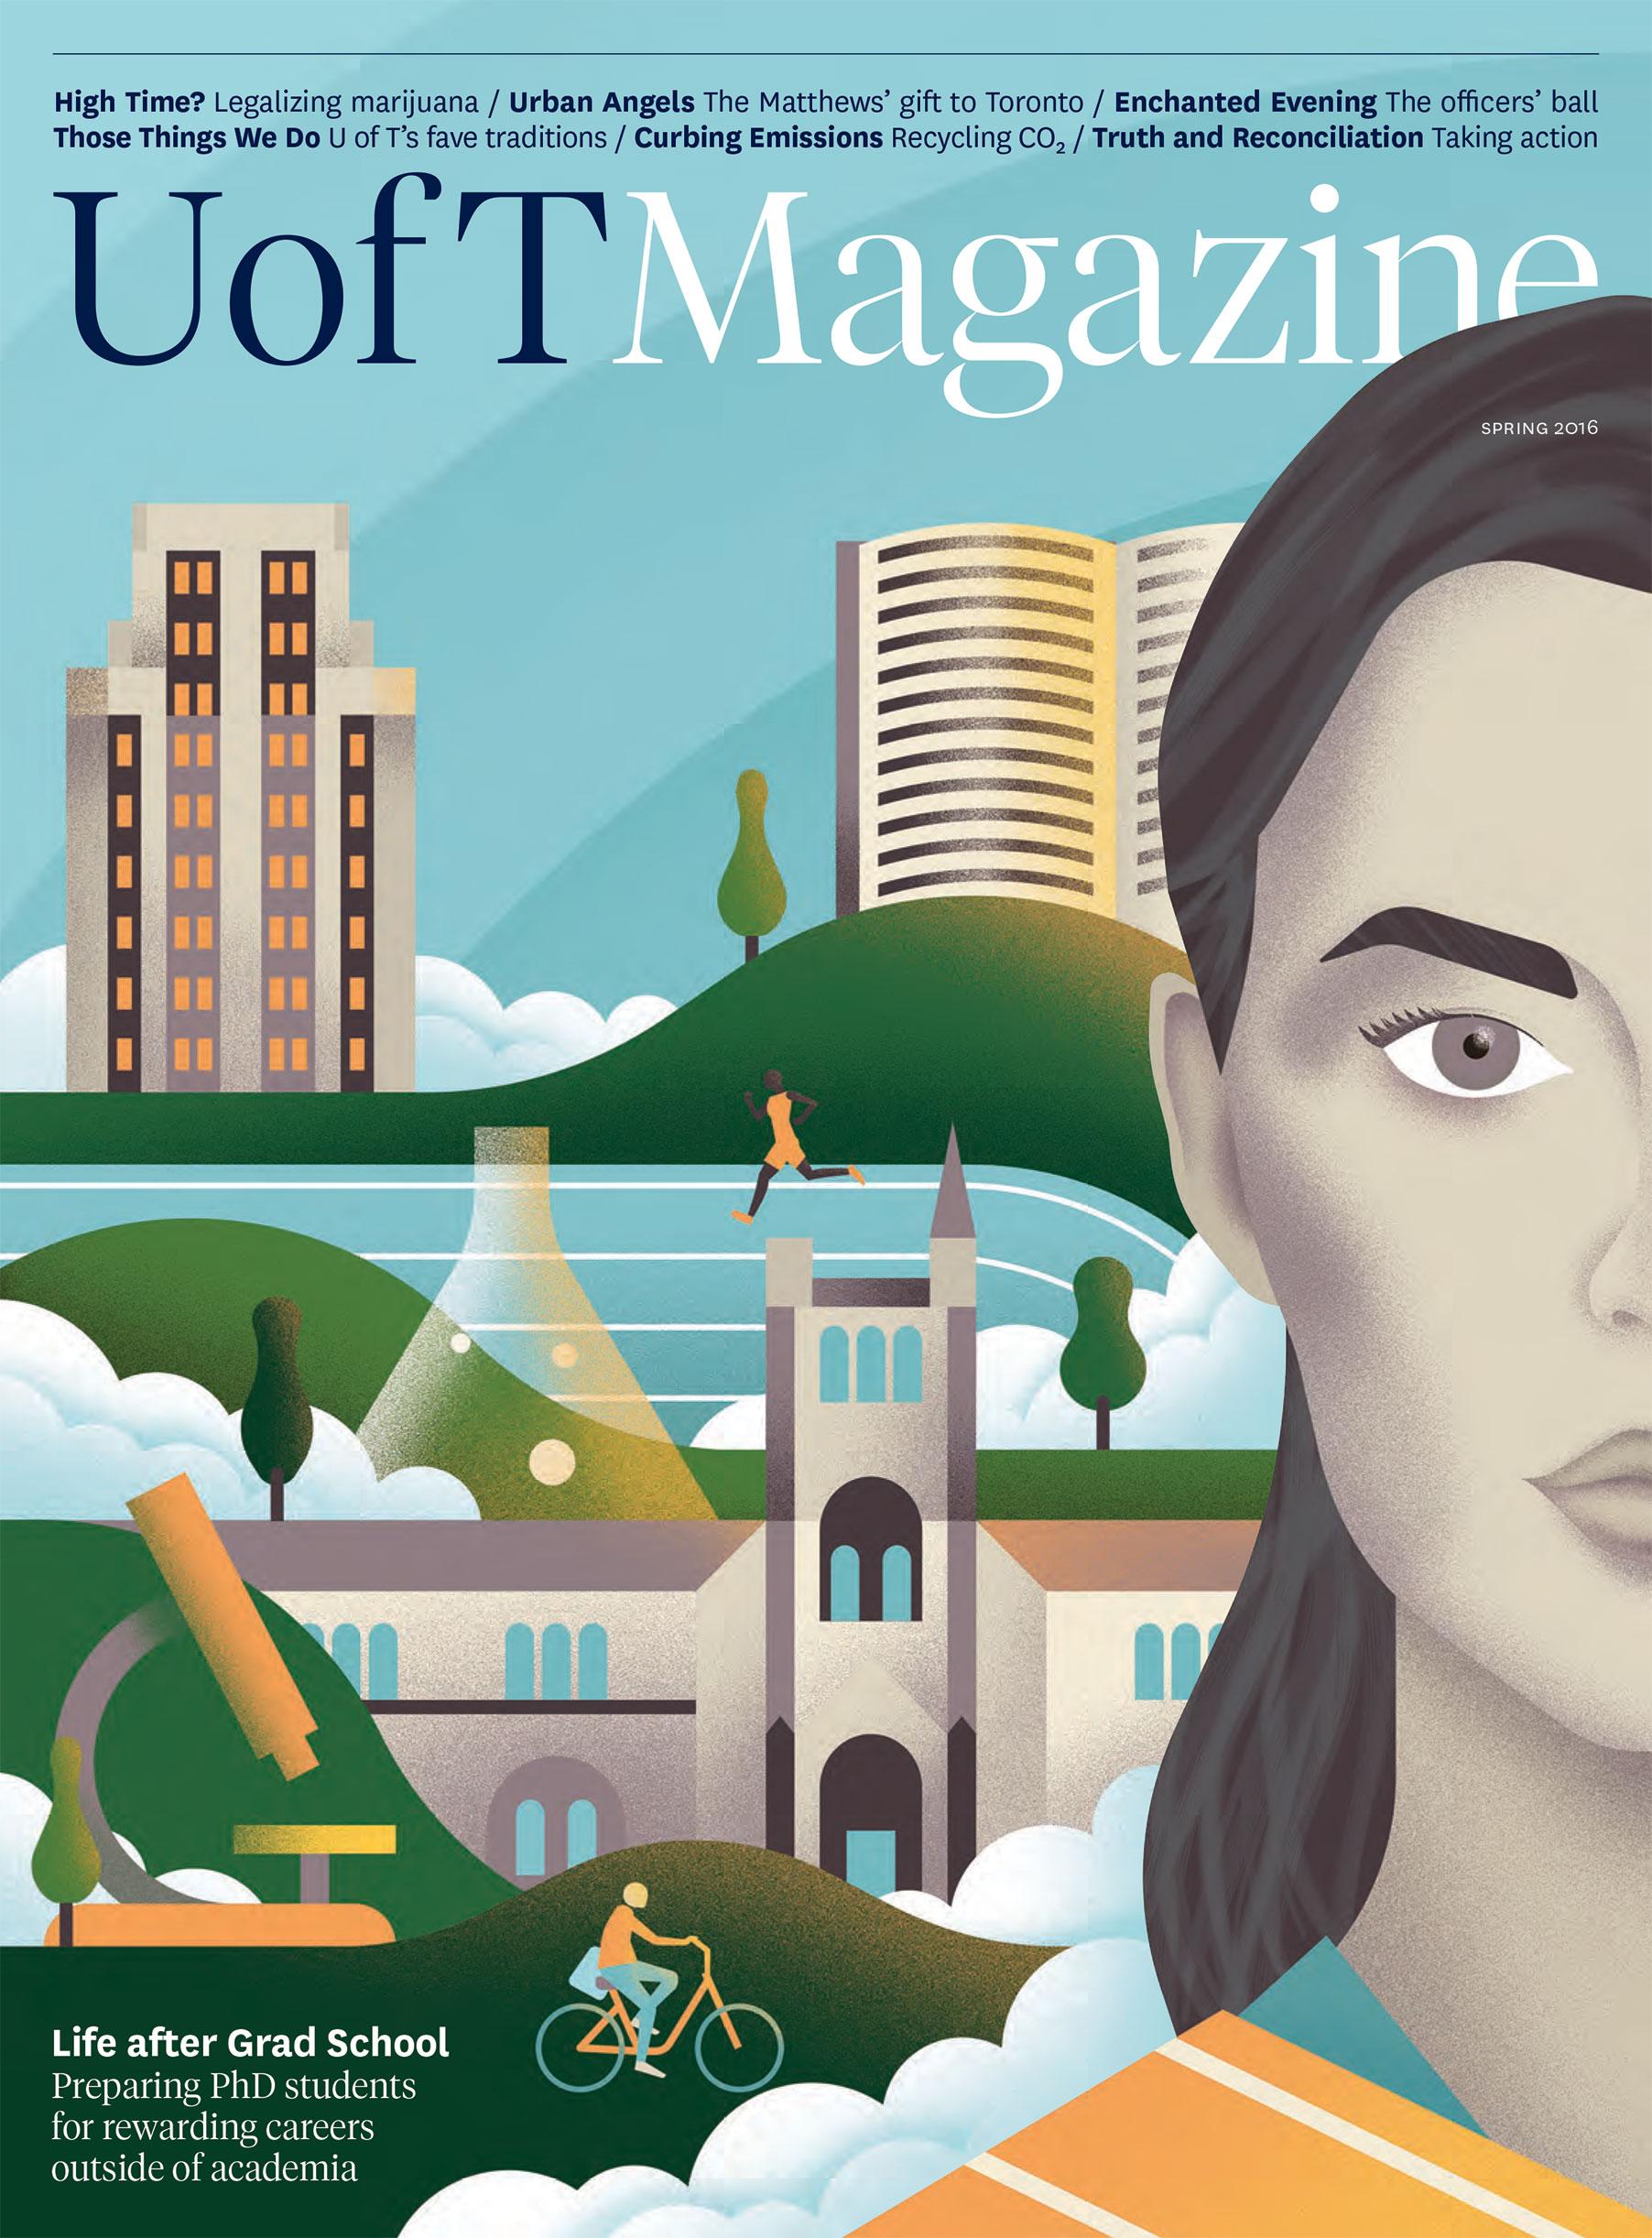 U of T Magazine Spring 2016